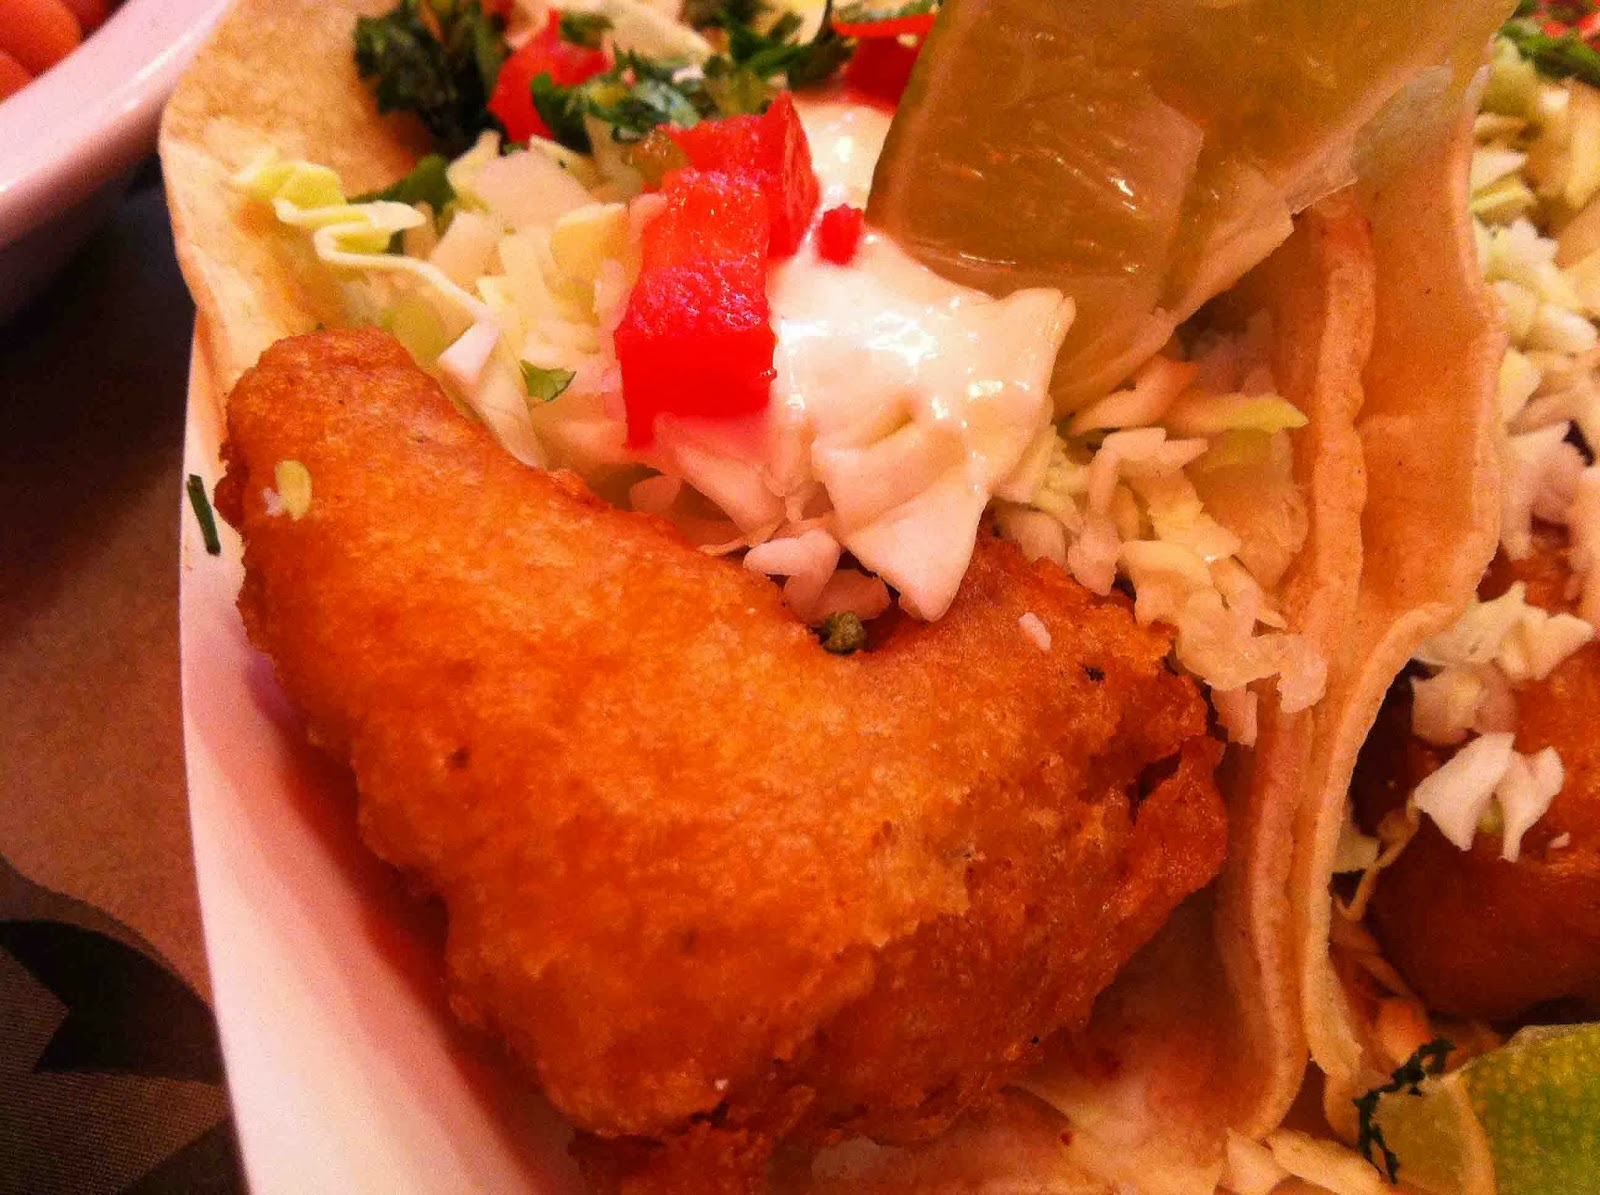 Cafe la la sea salt fish grill in santa monica glow 2013 for Seasalt fish grill